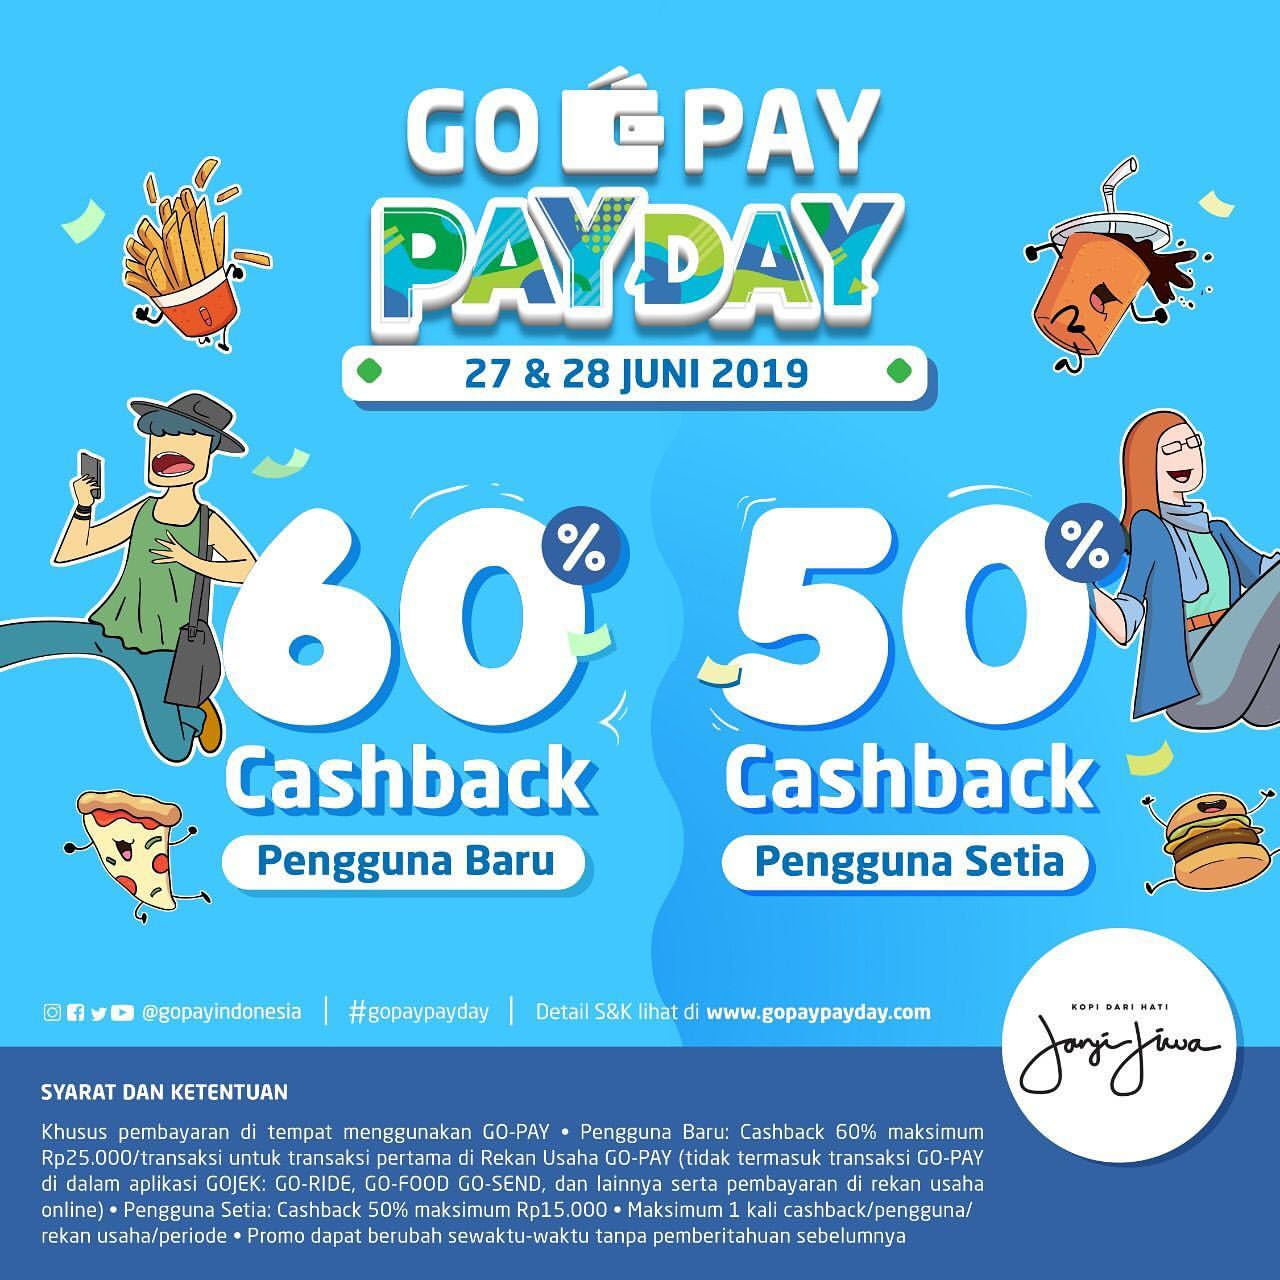 KOPI JANJI JIWA Promo GOPAY PAYDAY, CASHBACK hingga 60% dengan GOPAY